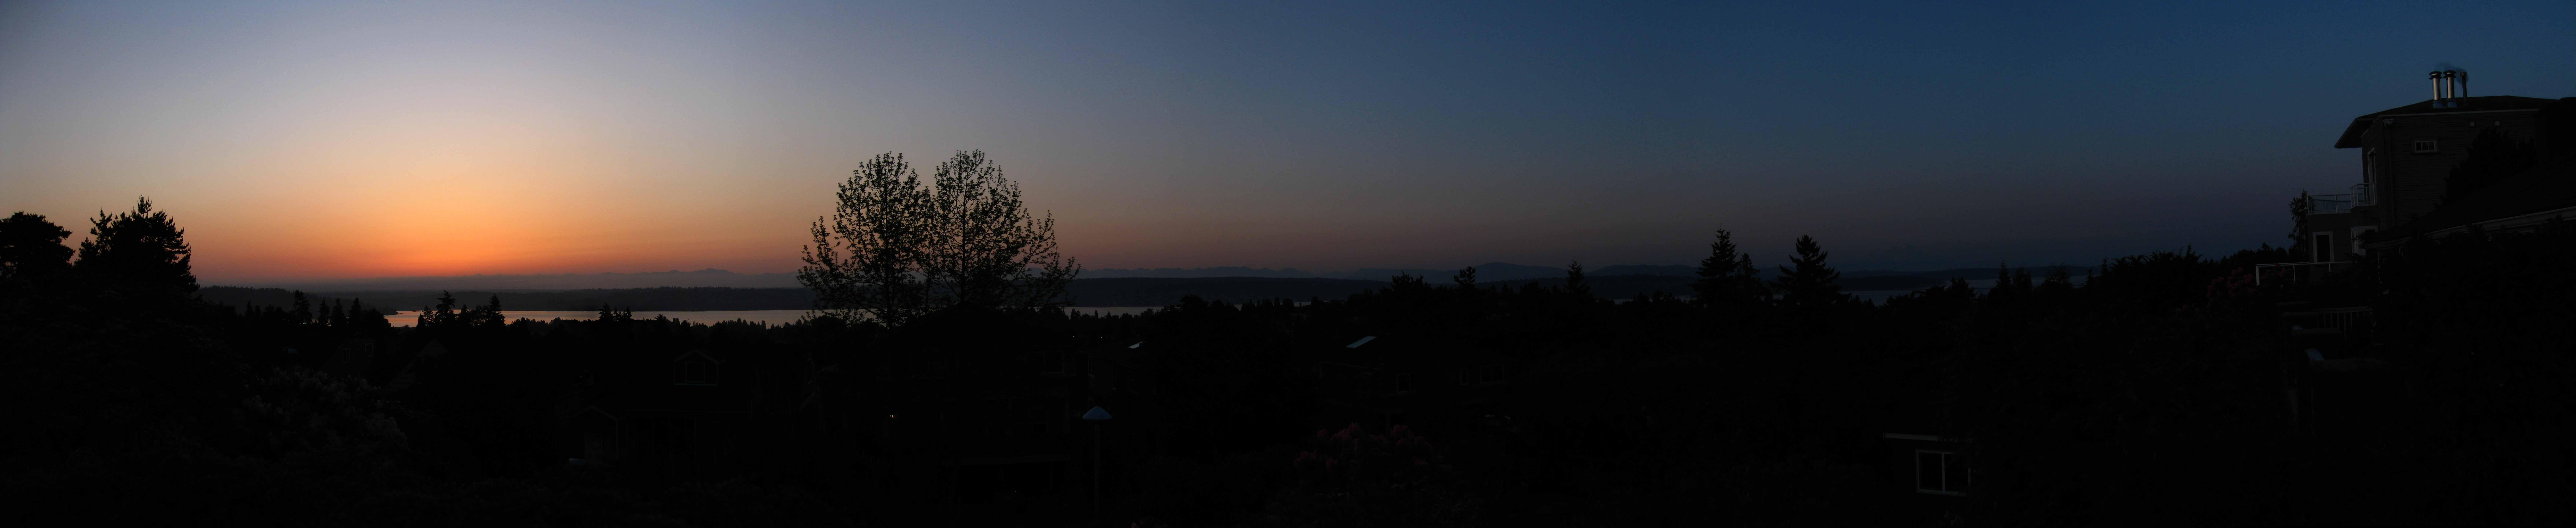 Seattle Sunrise Panorama by John Cuthbert